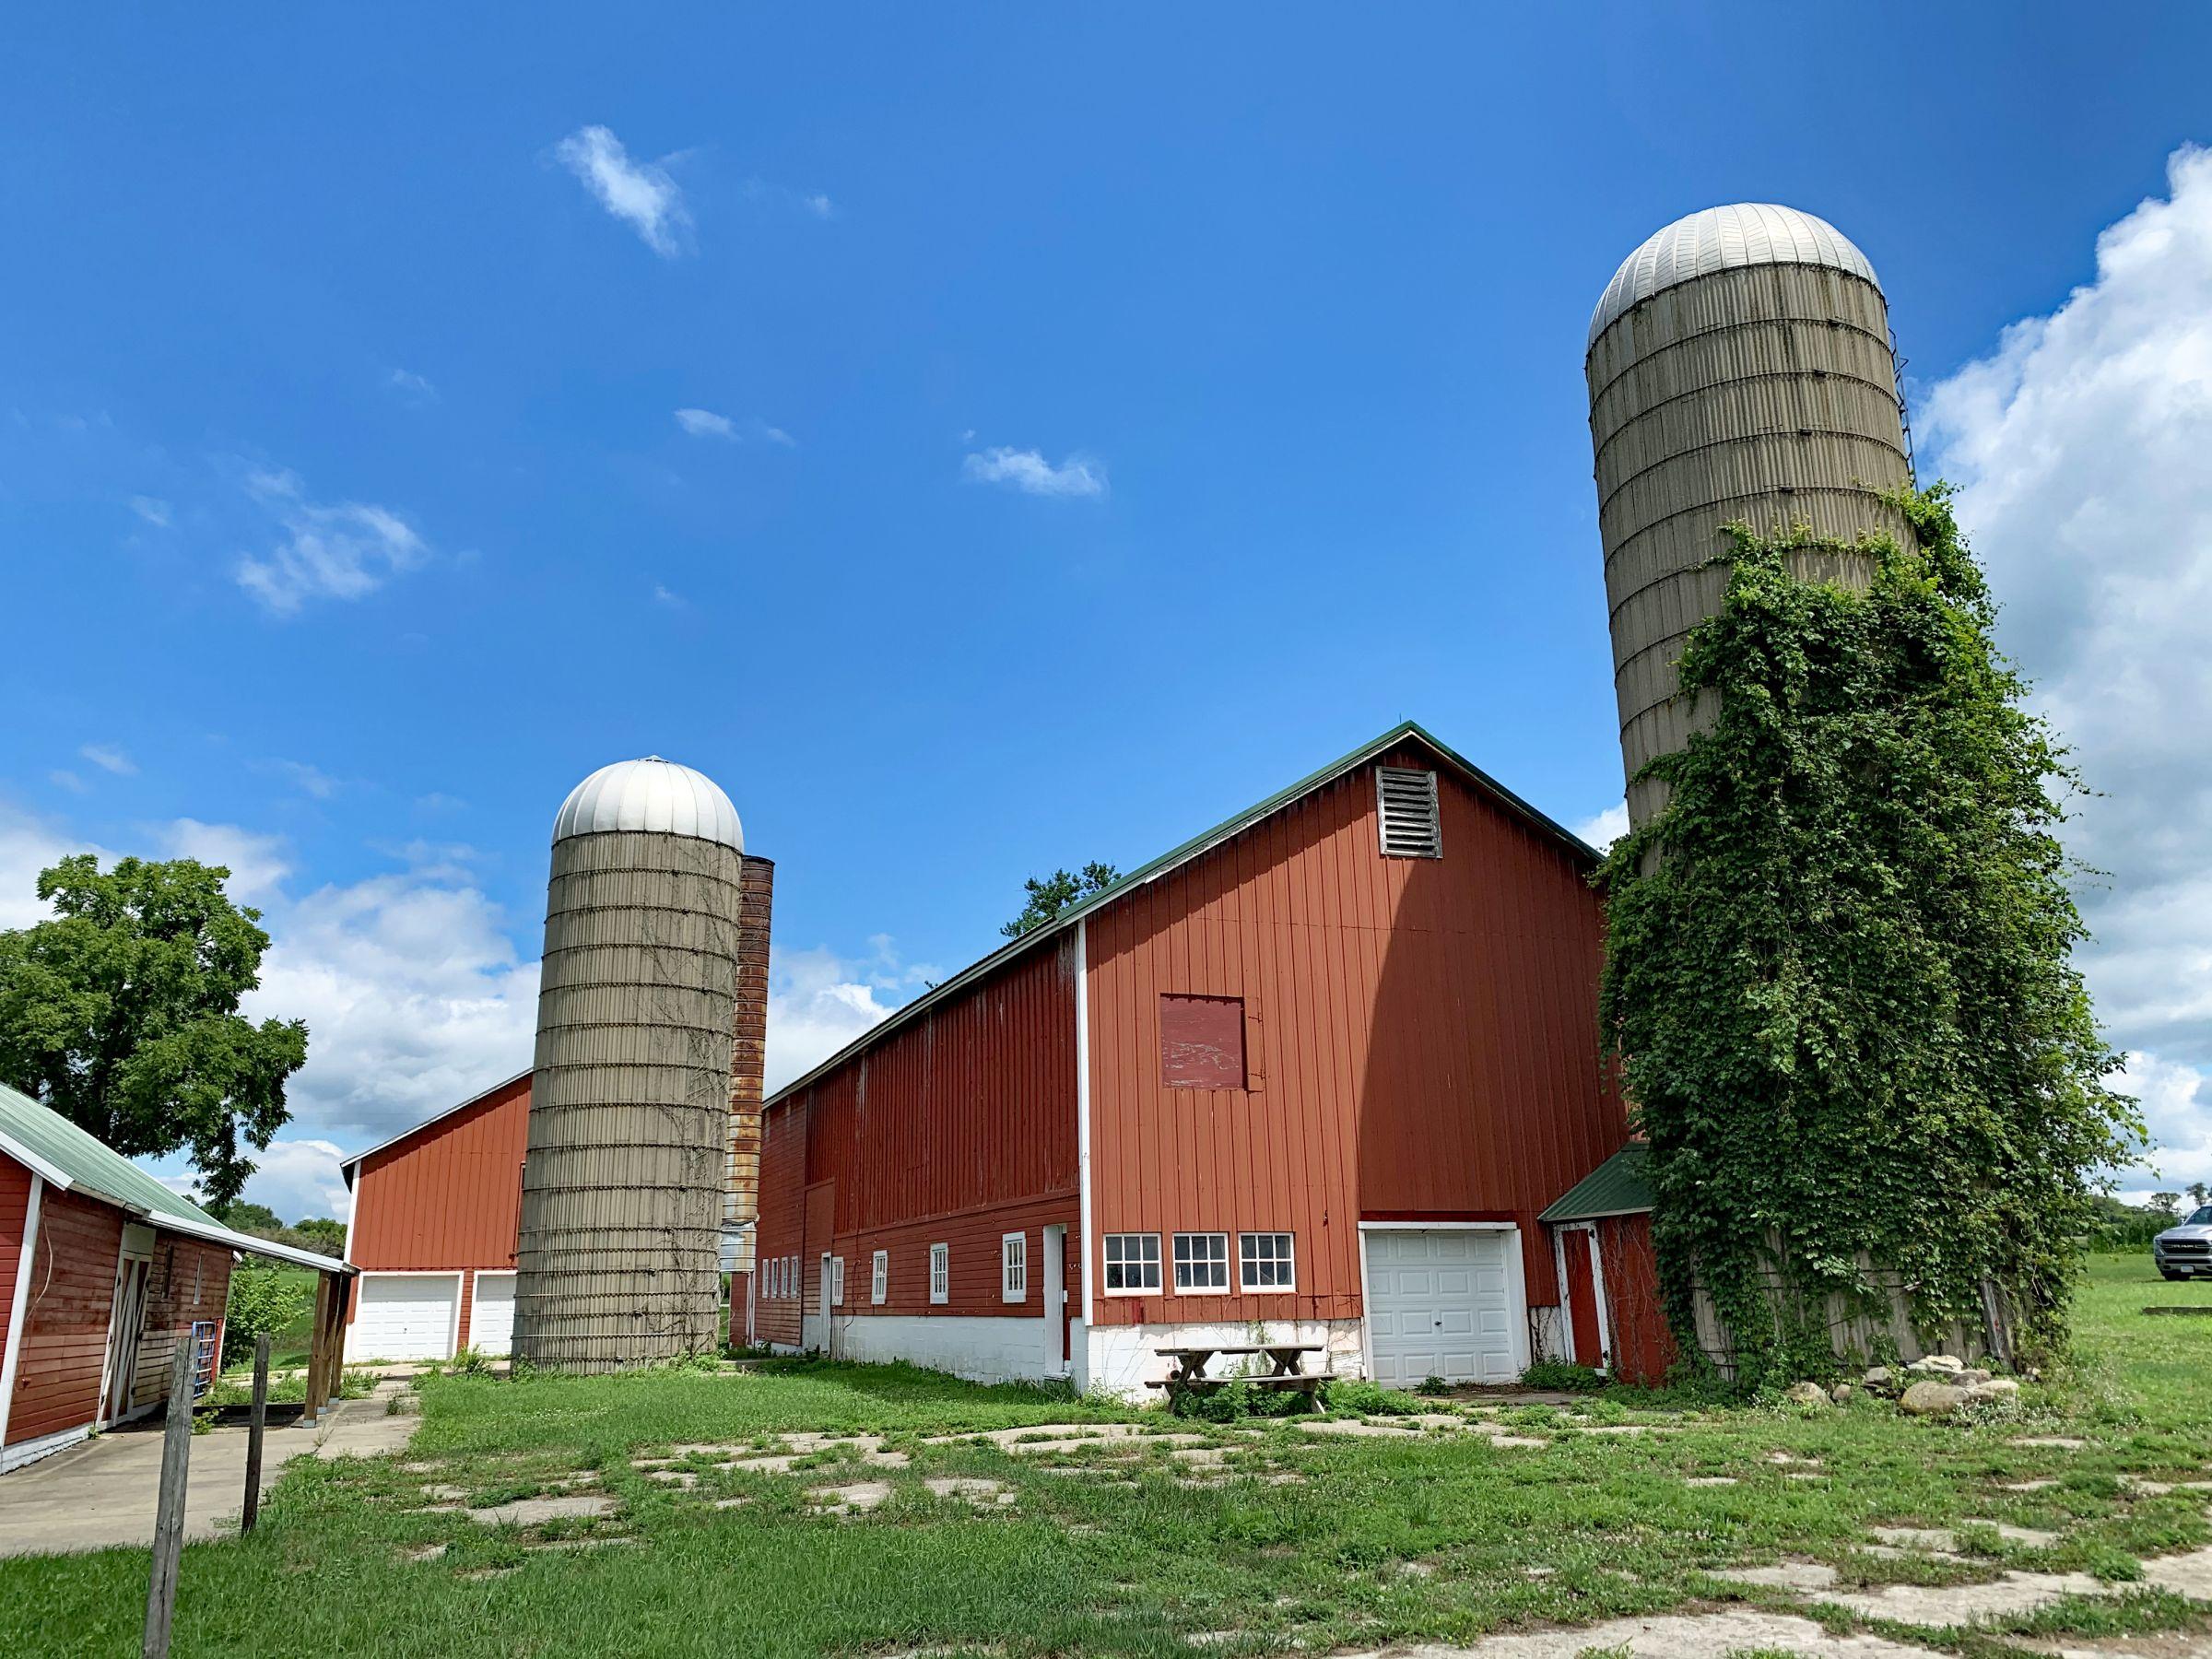 land-winnebago-county-illinois-127-acres-listing-number-15094-7-2020-08-03-160430.jpg